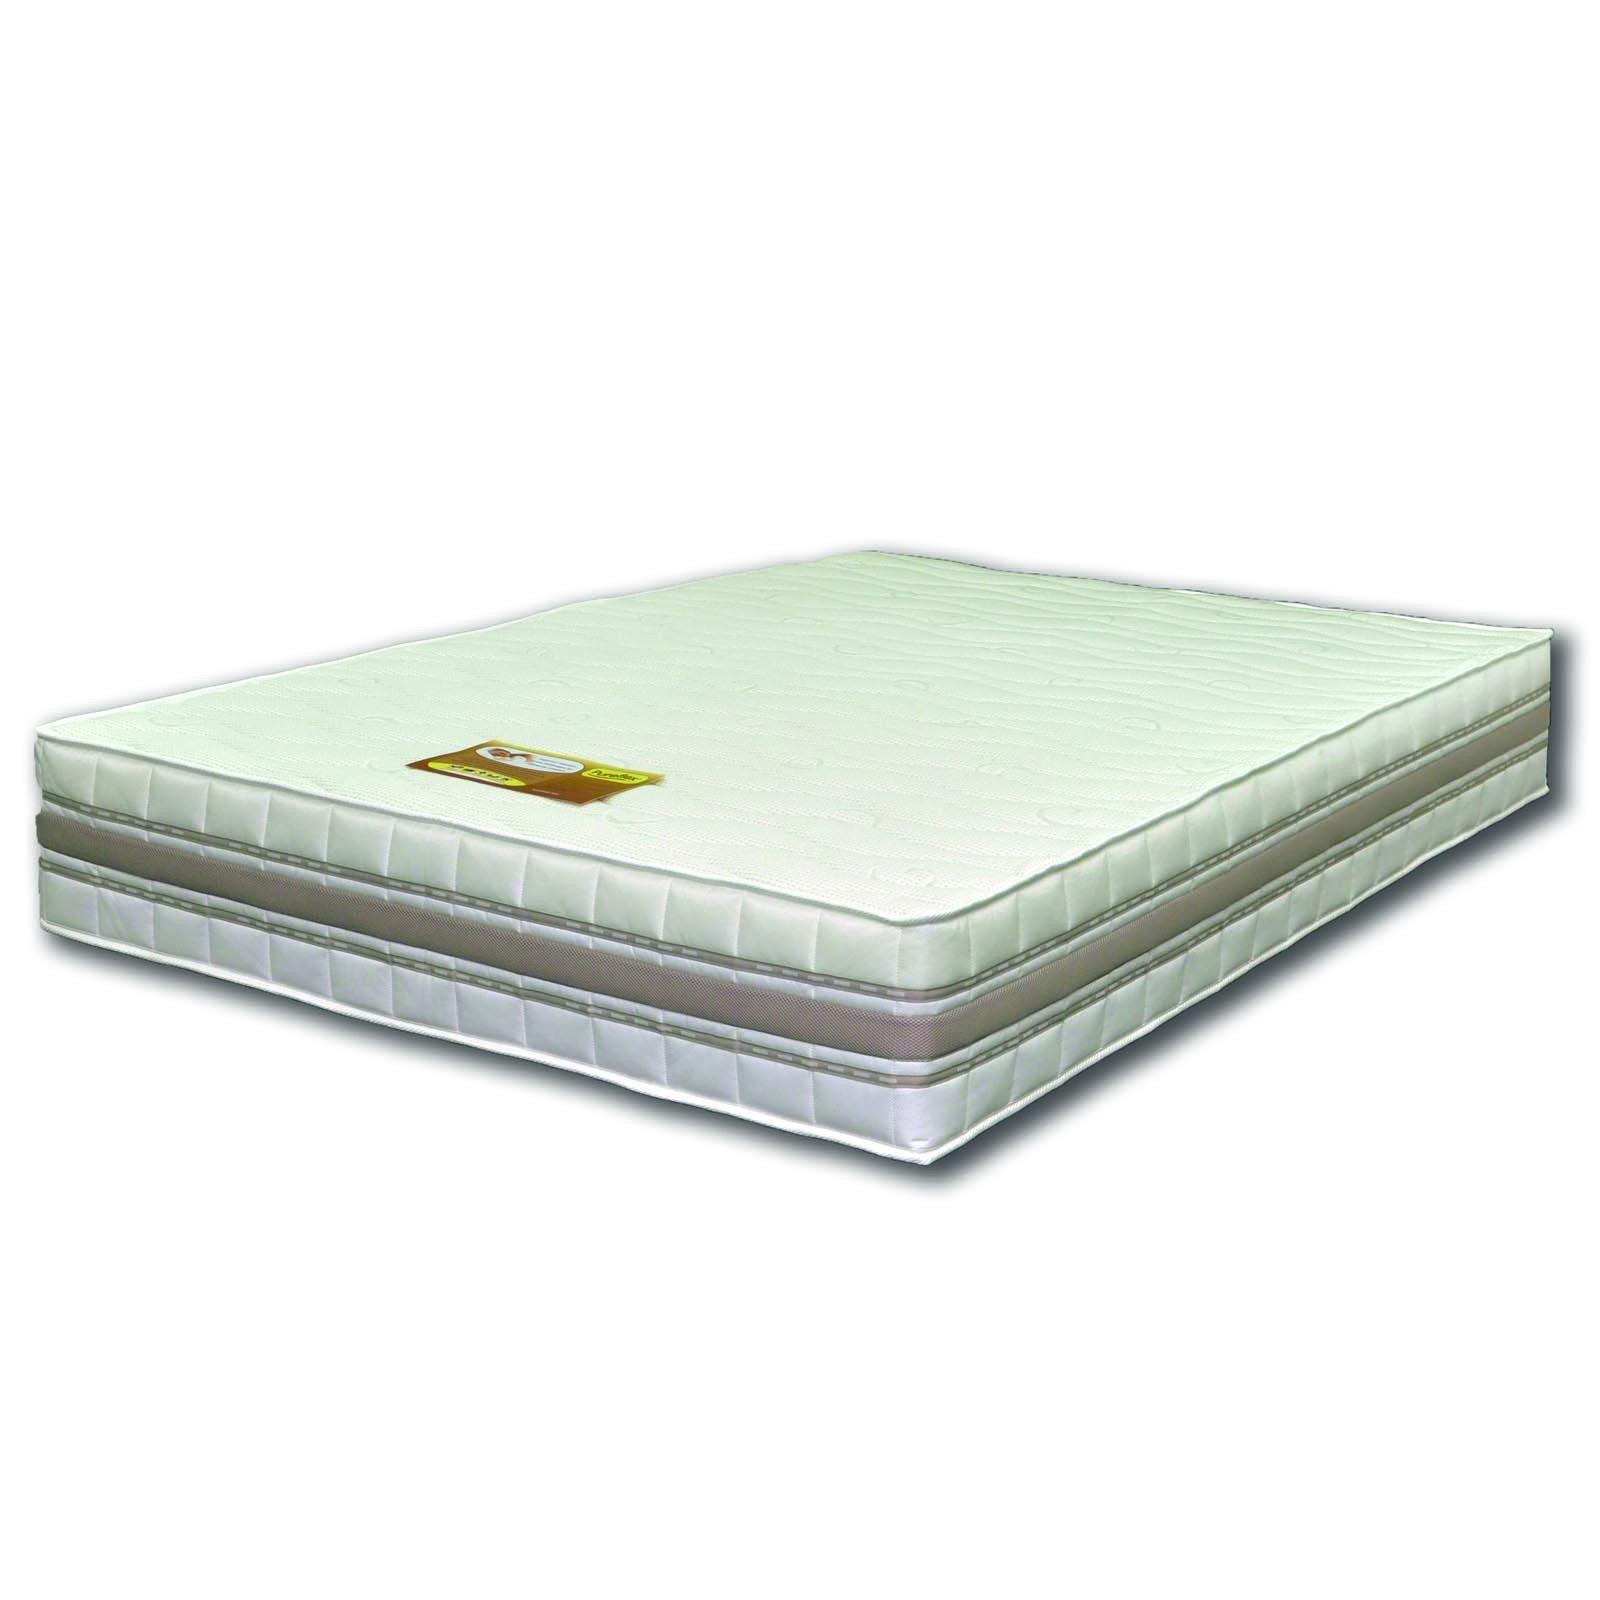 "image-Hf4you Pureflex® 10"" Latex Foam Mattress"